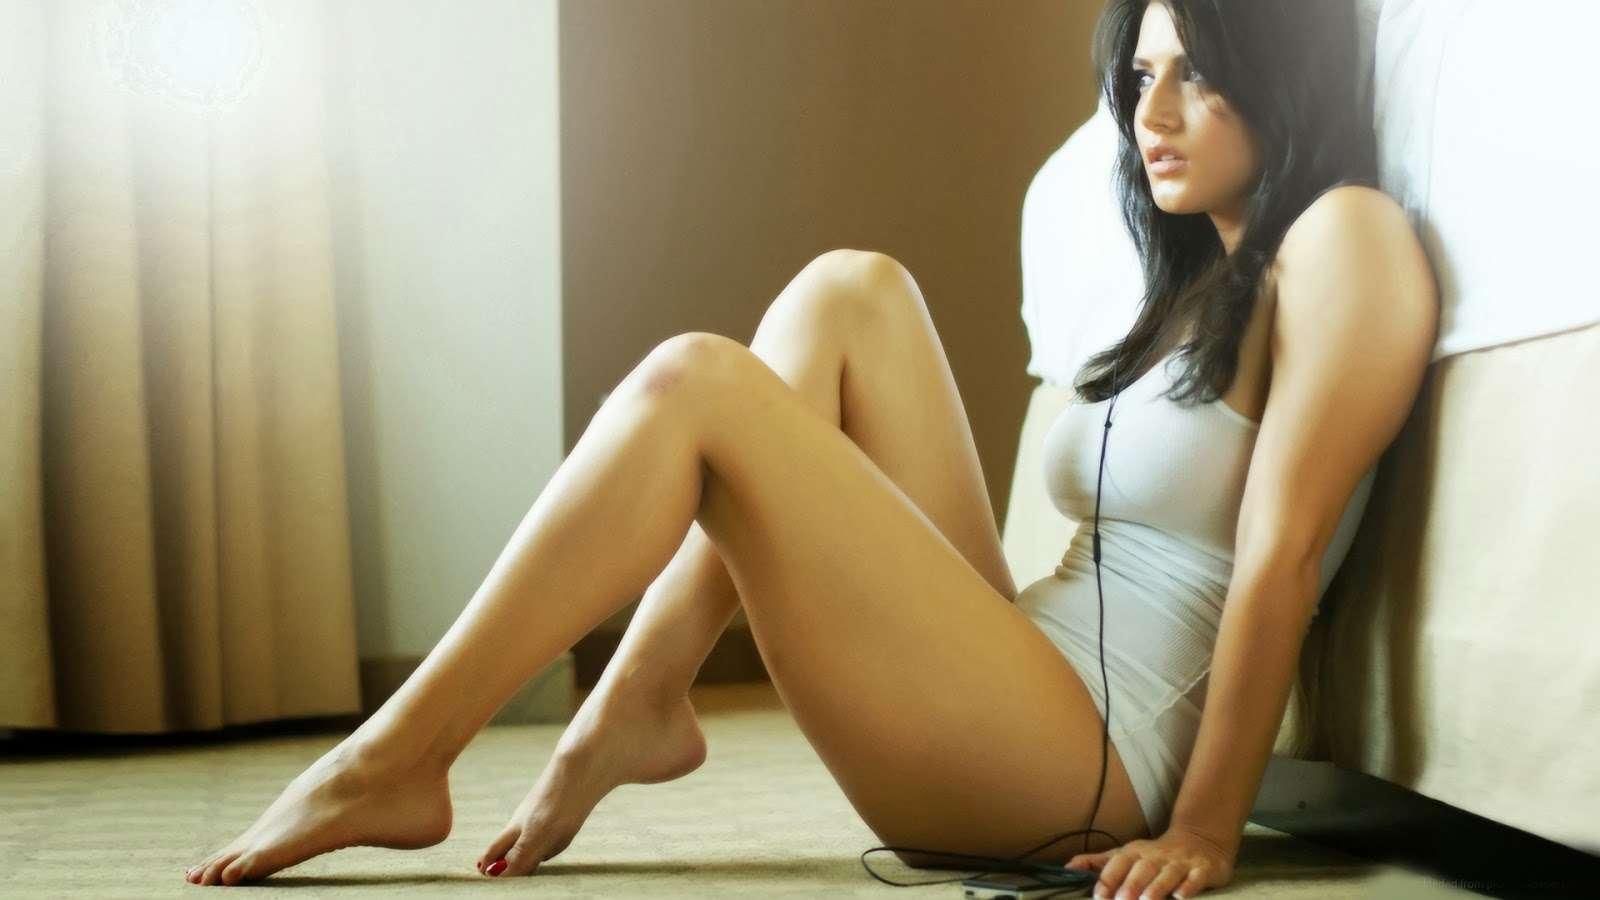 single women wanting sex babes escorts